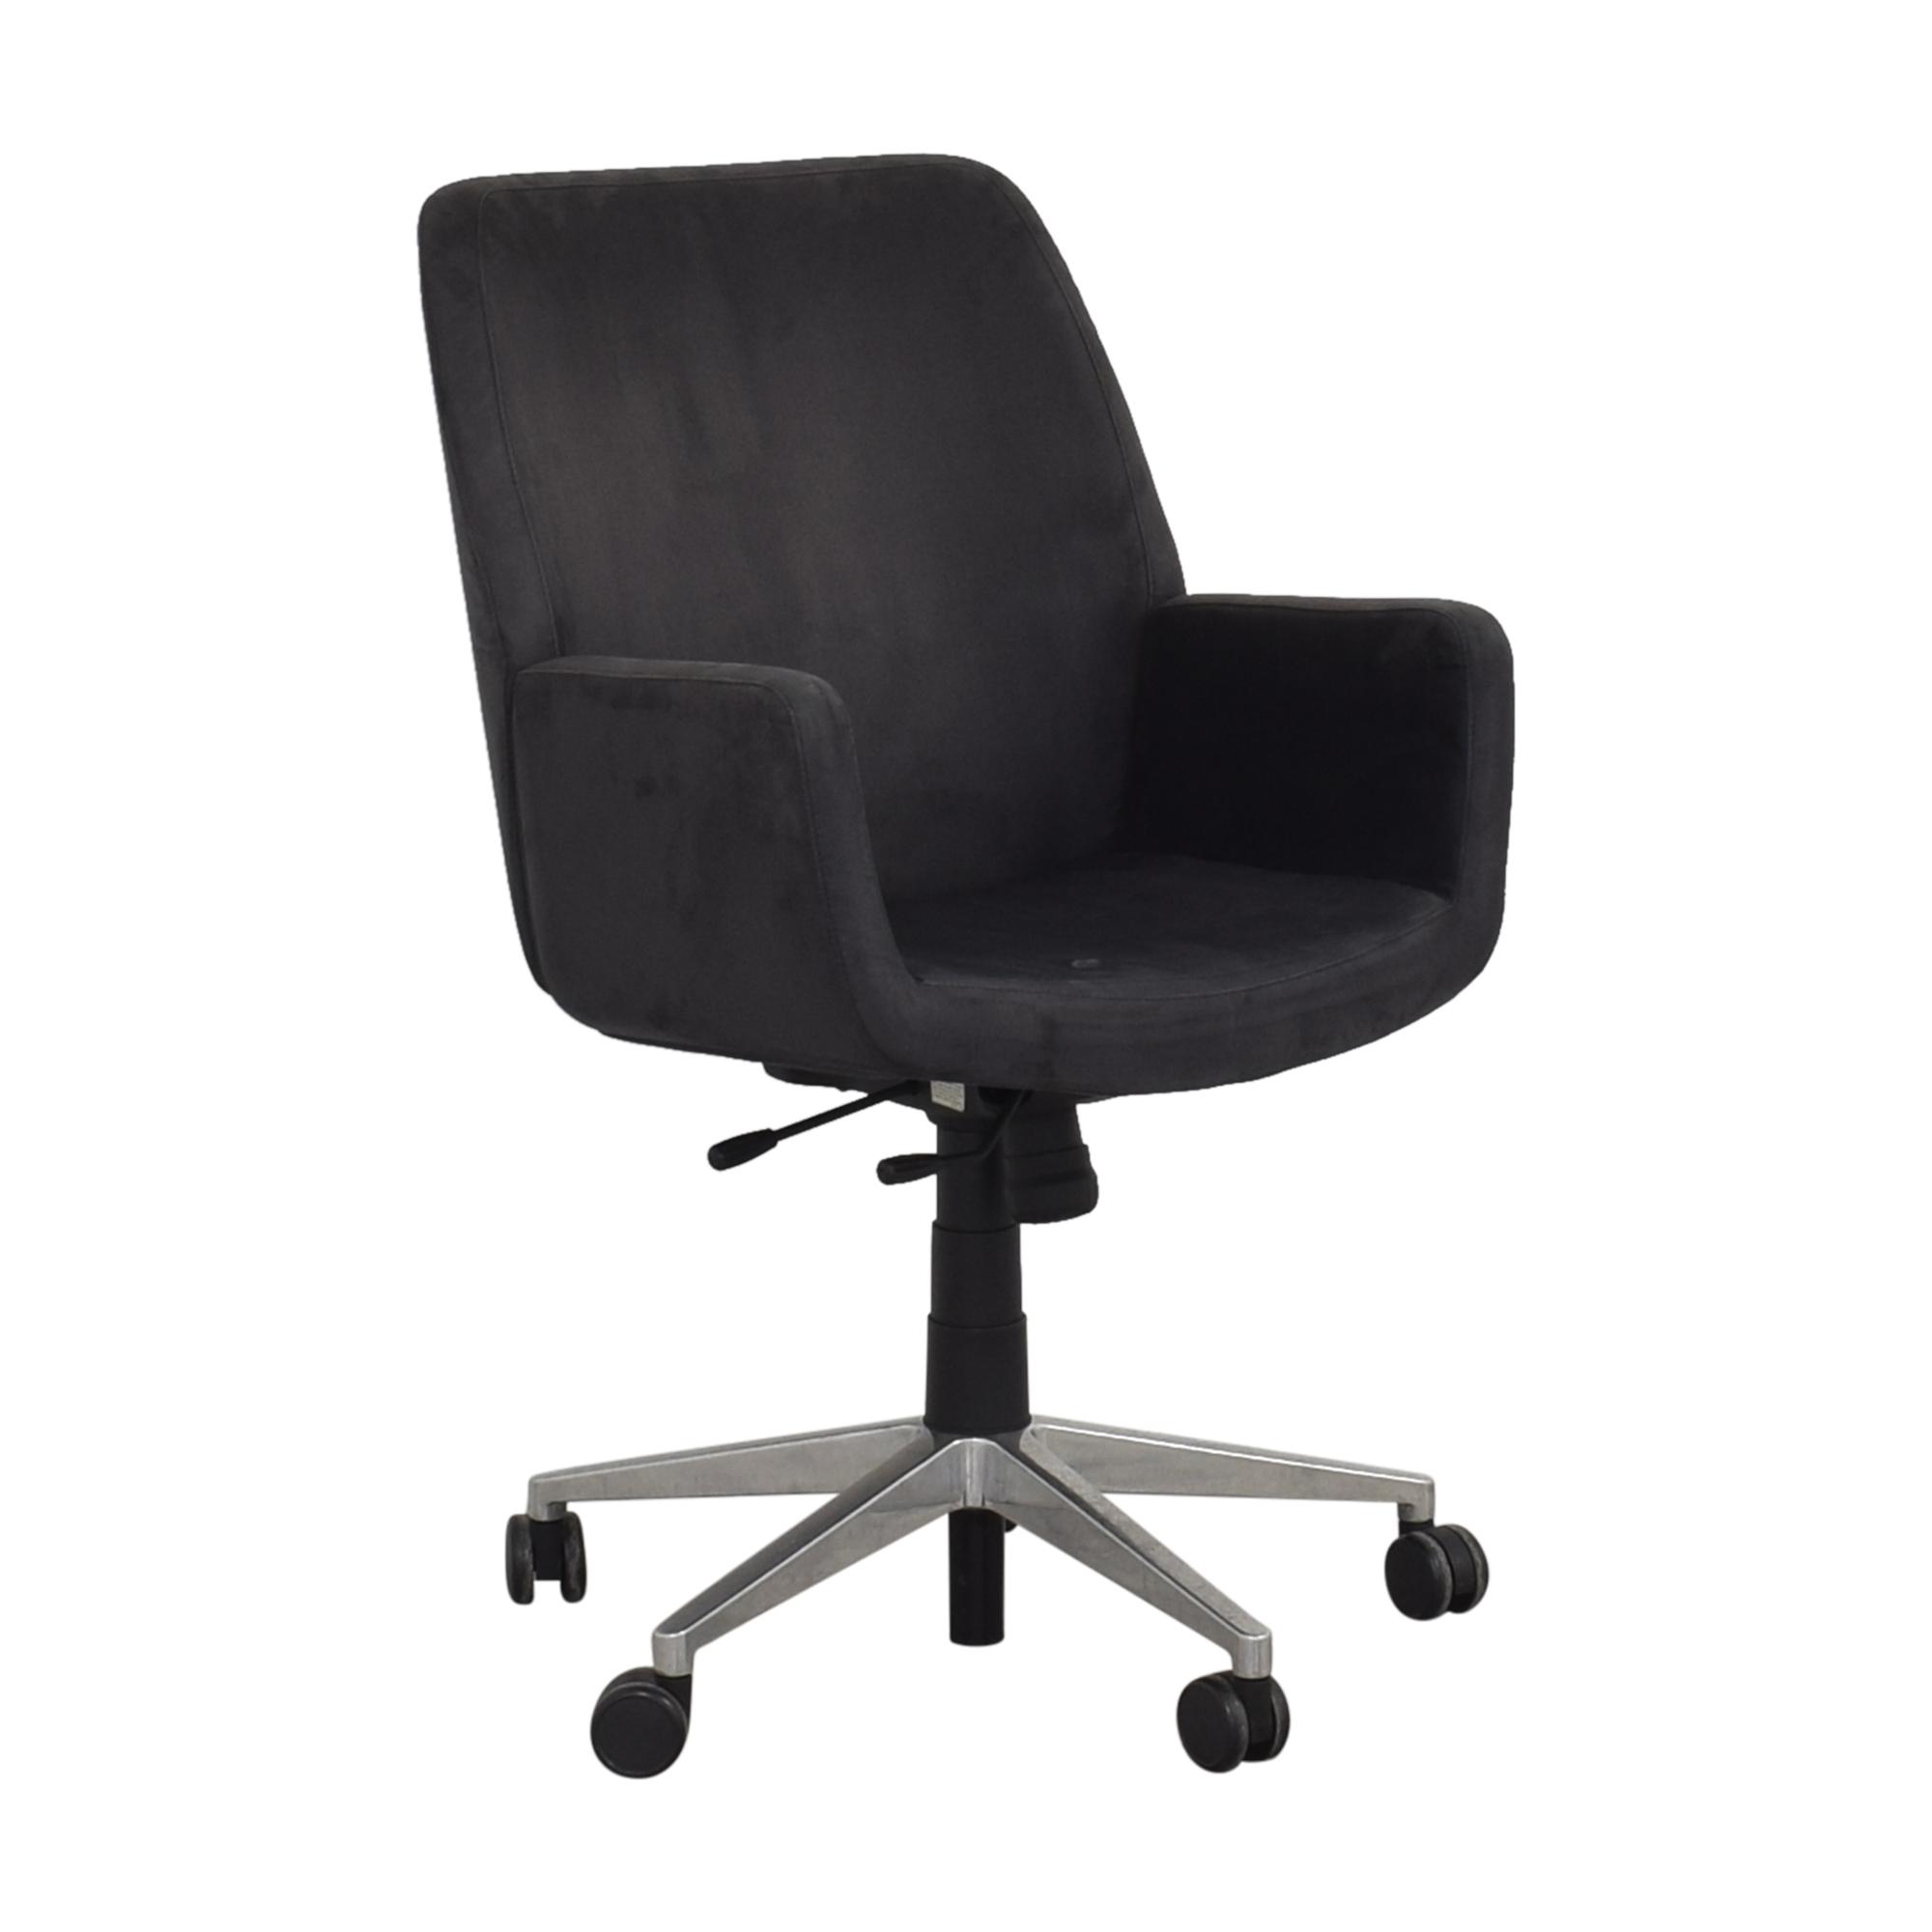 Steelcase Steelcase Coalesse Bindu Guest Chair pa